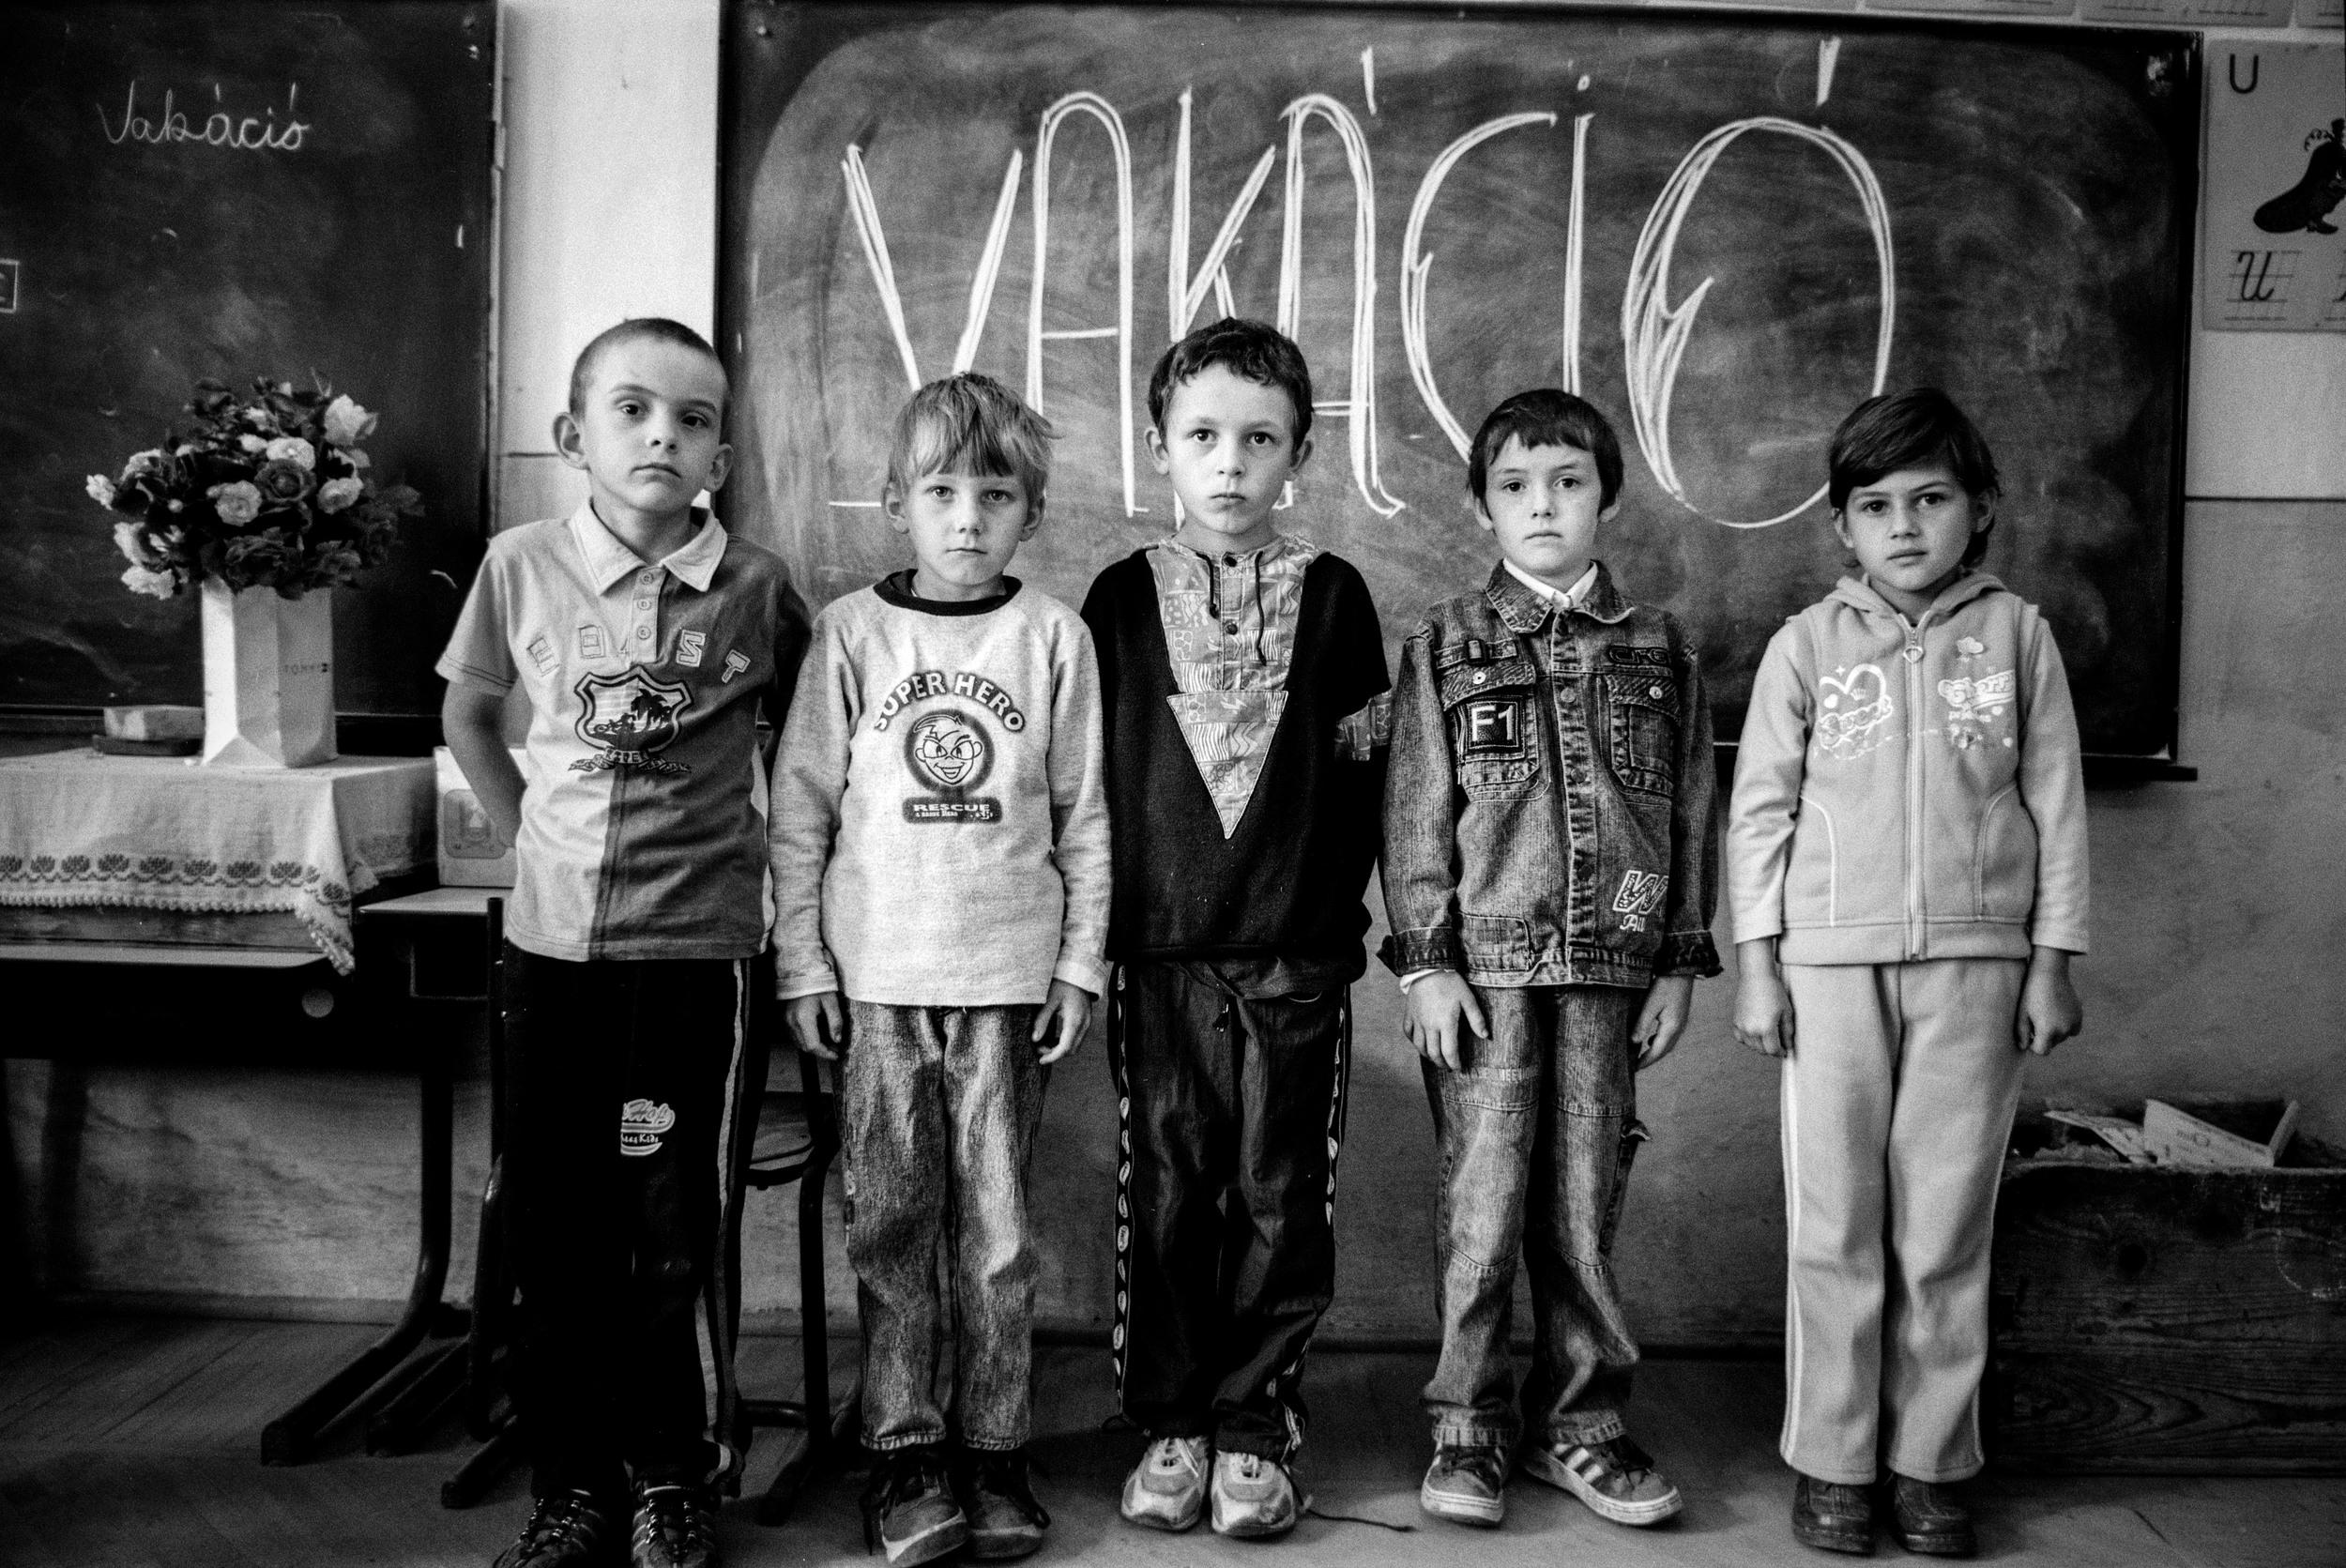 The last class of elementary school. Siklód, Romania, 2009